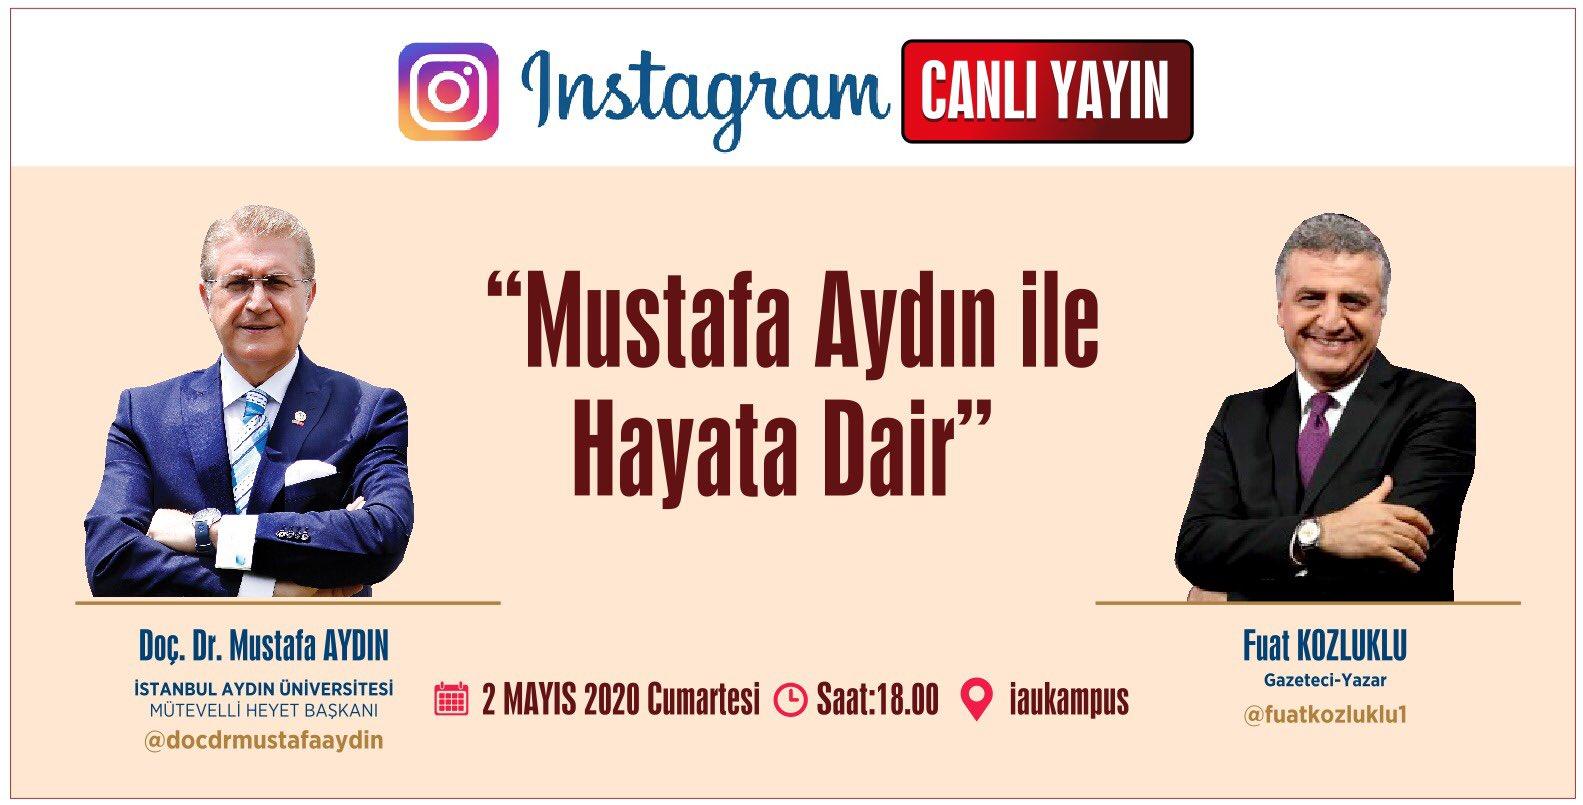 http://mustafaaydin.com/wp-content/uploads/2020/06/FUAT-KOZLUKLU.jpg